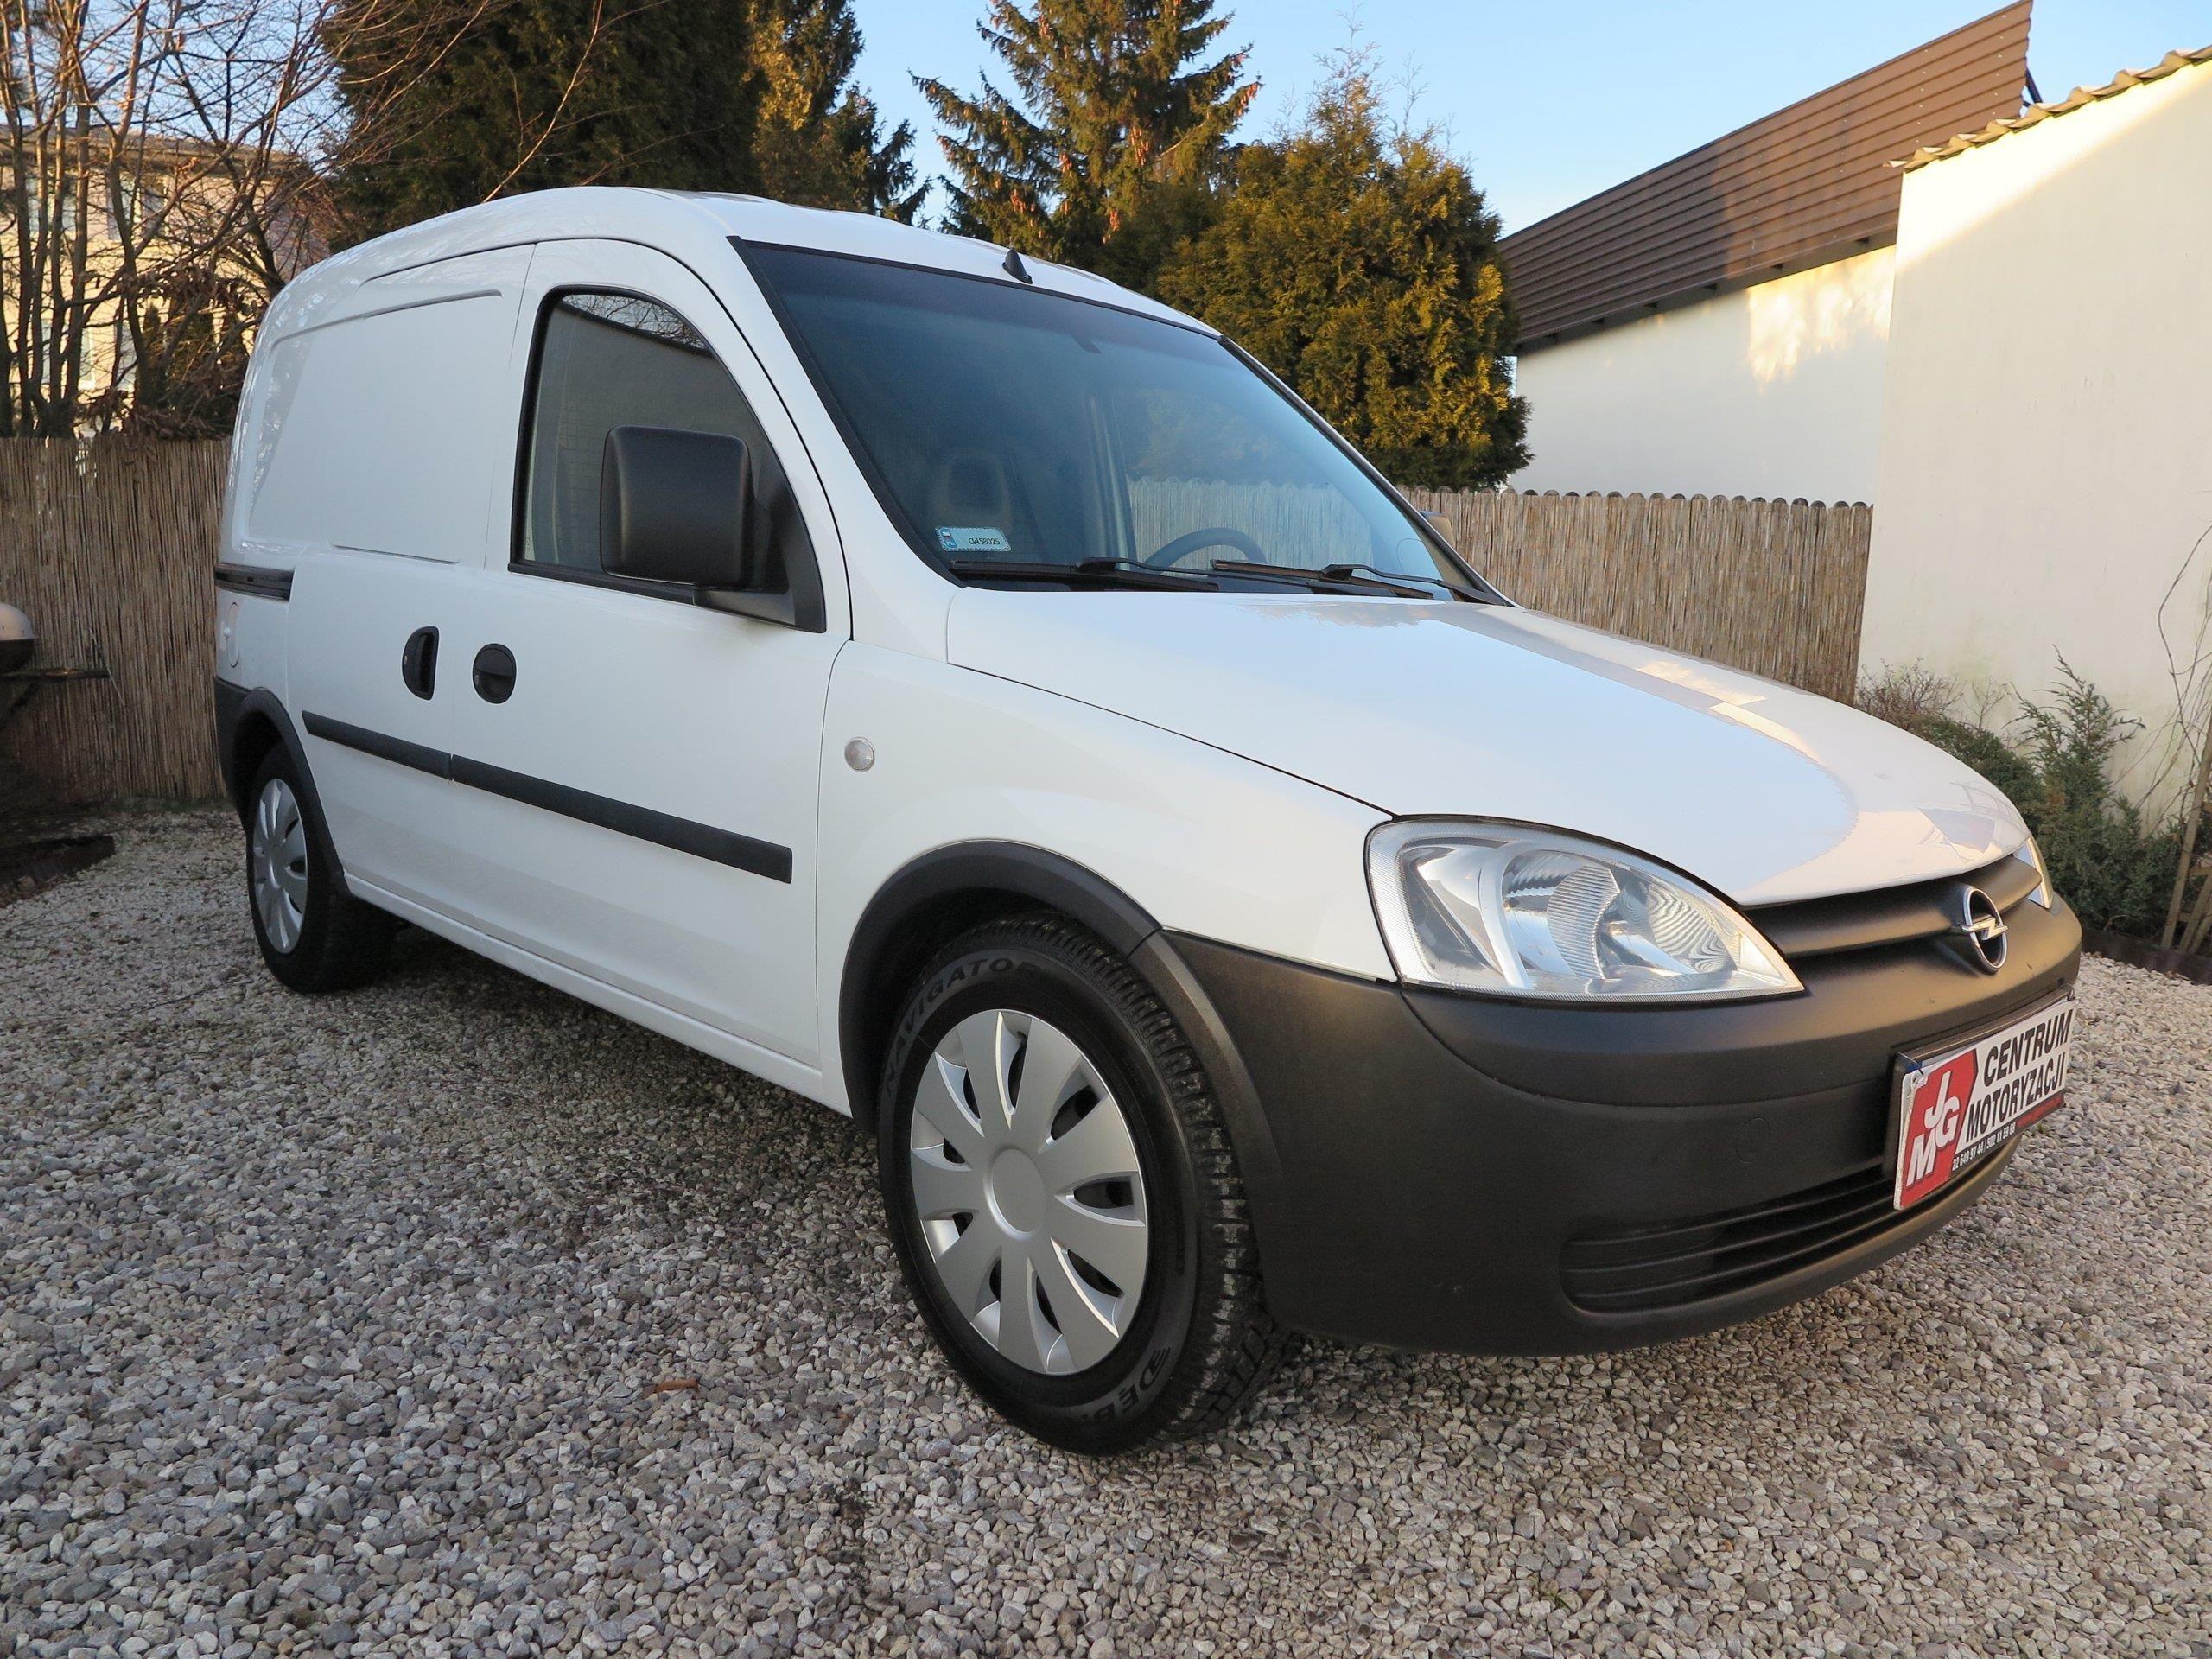 Opel combo van salon polska klimatyzacja vat opinie i ceny